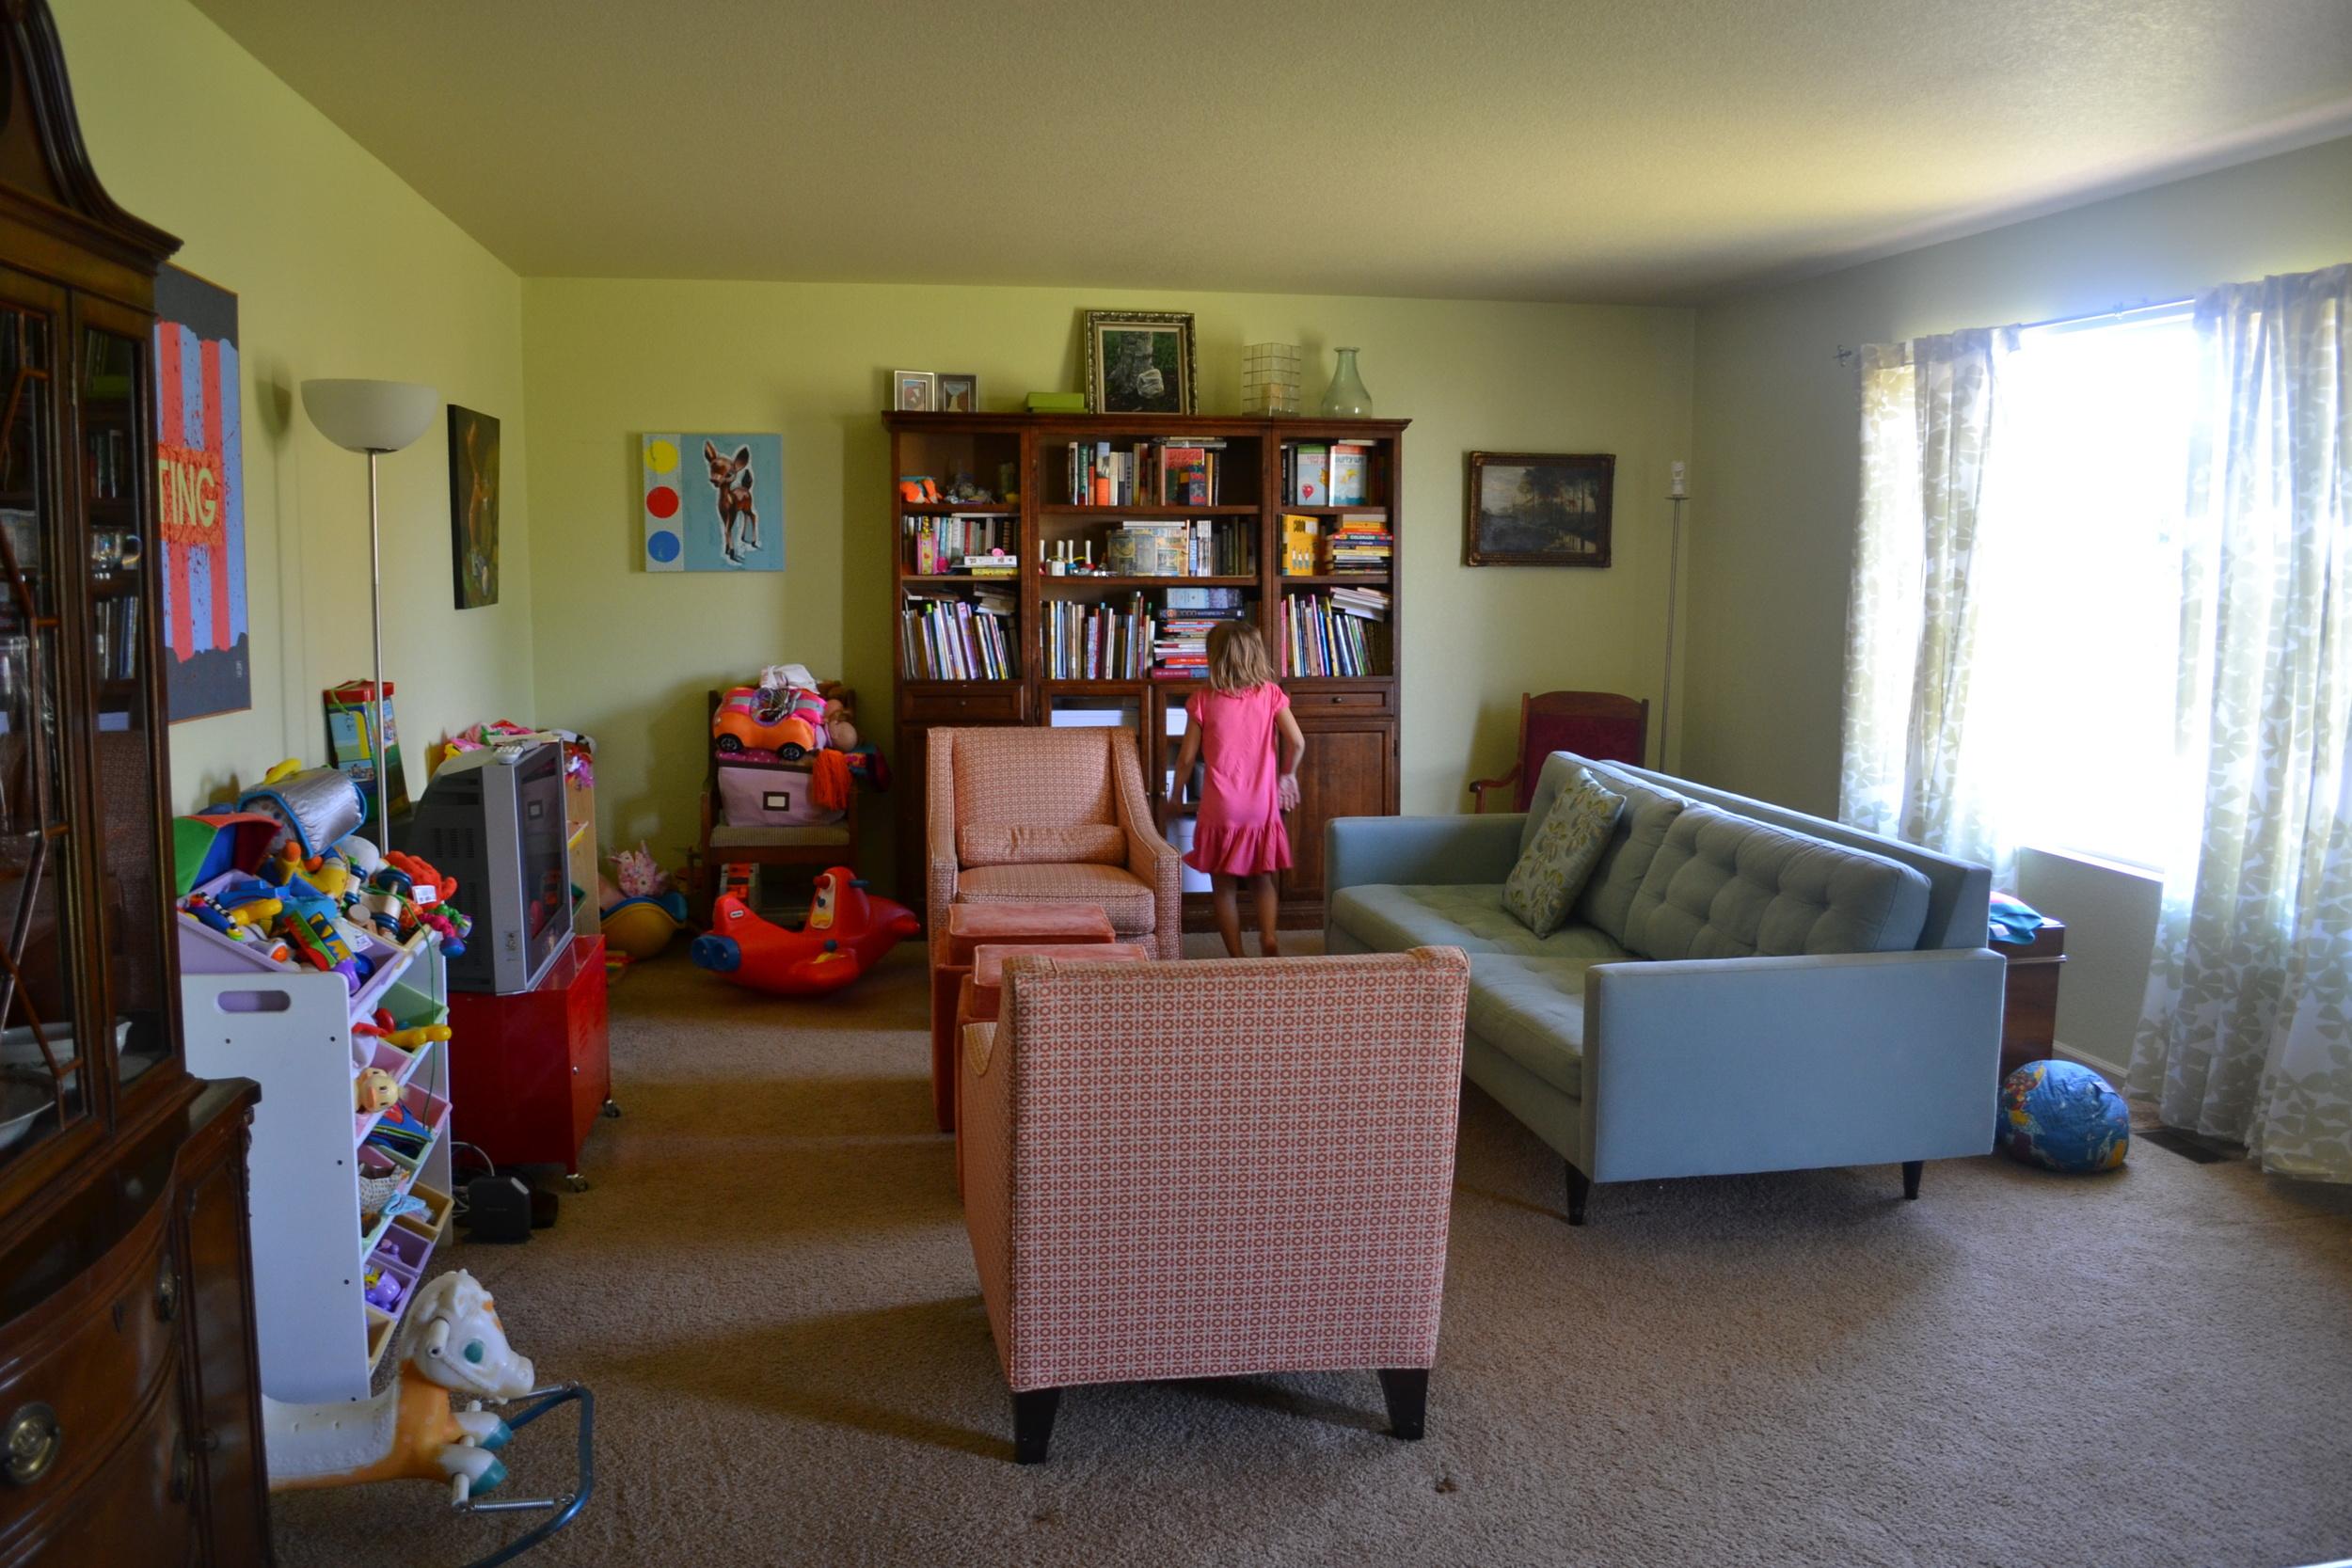 A family room